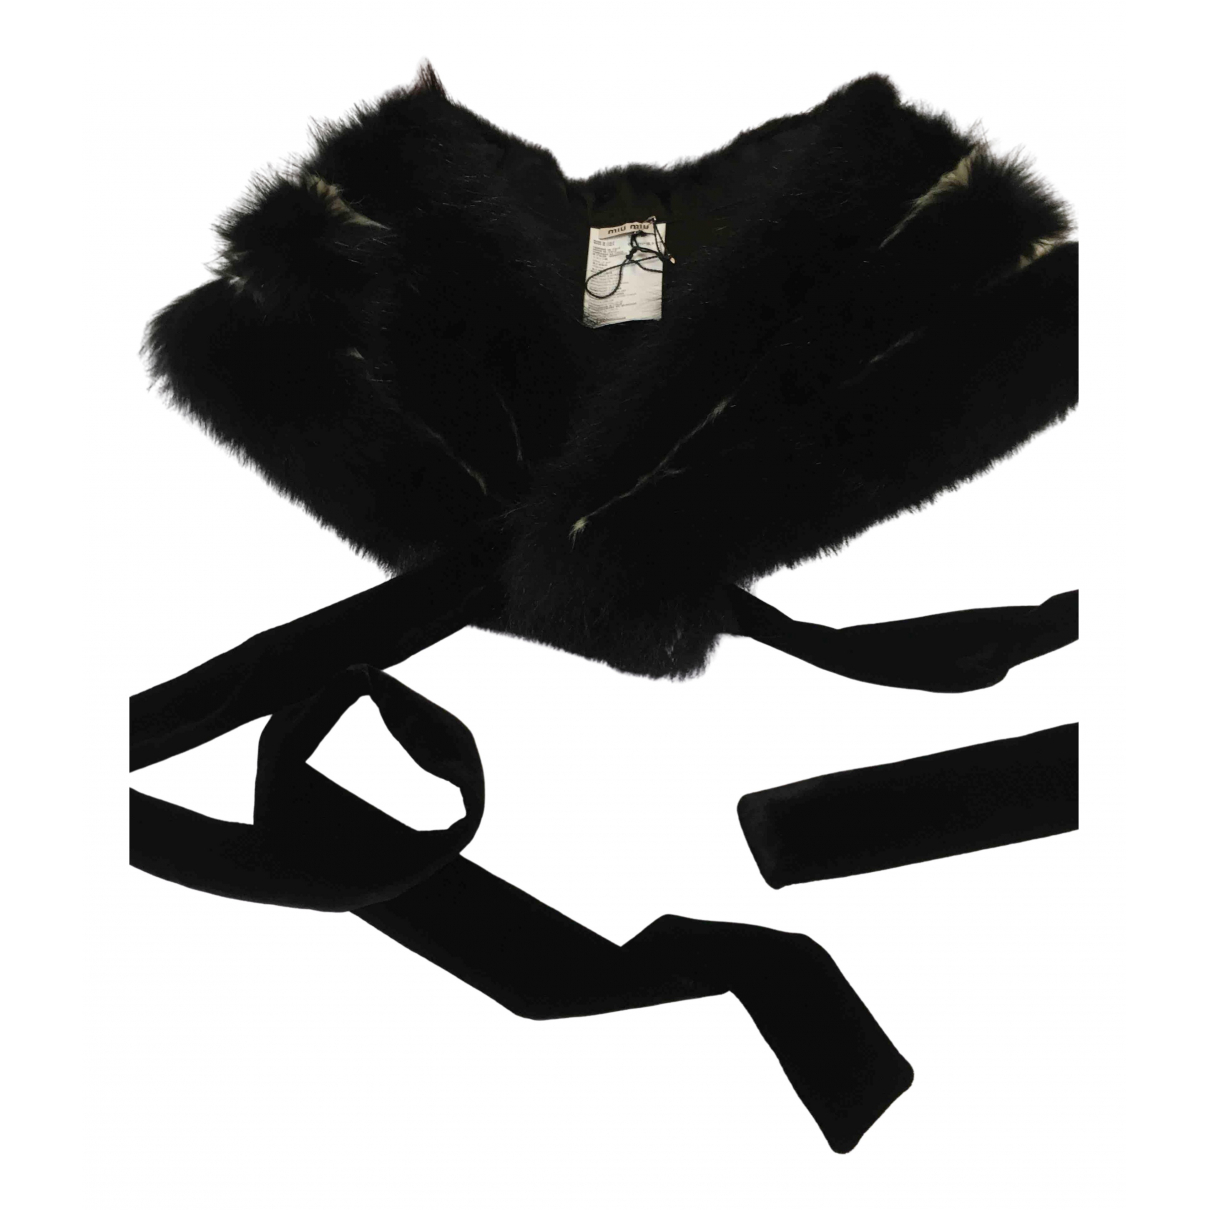 Miu Miu - Foulard   pour femme en fourrure - noir